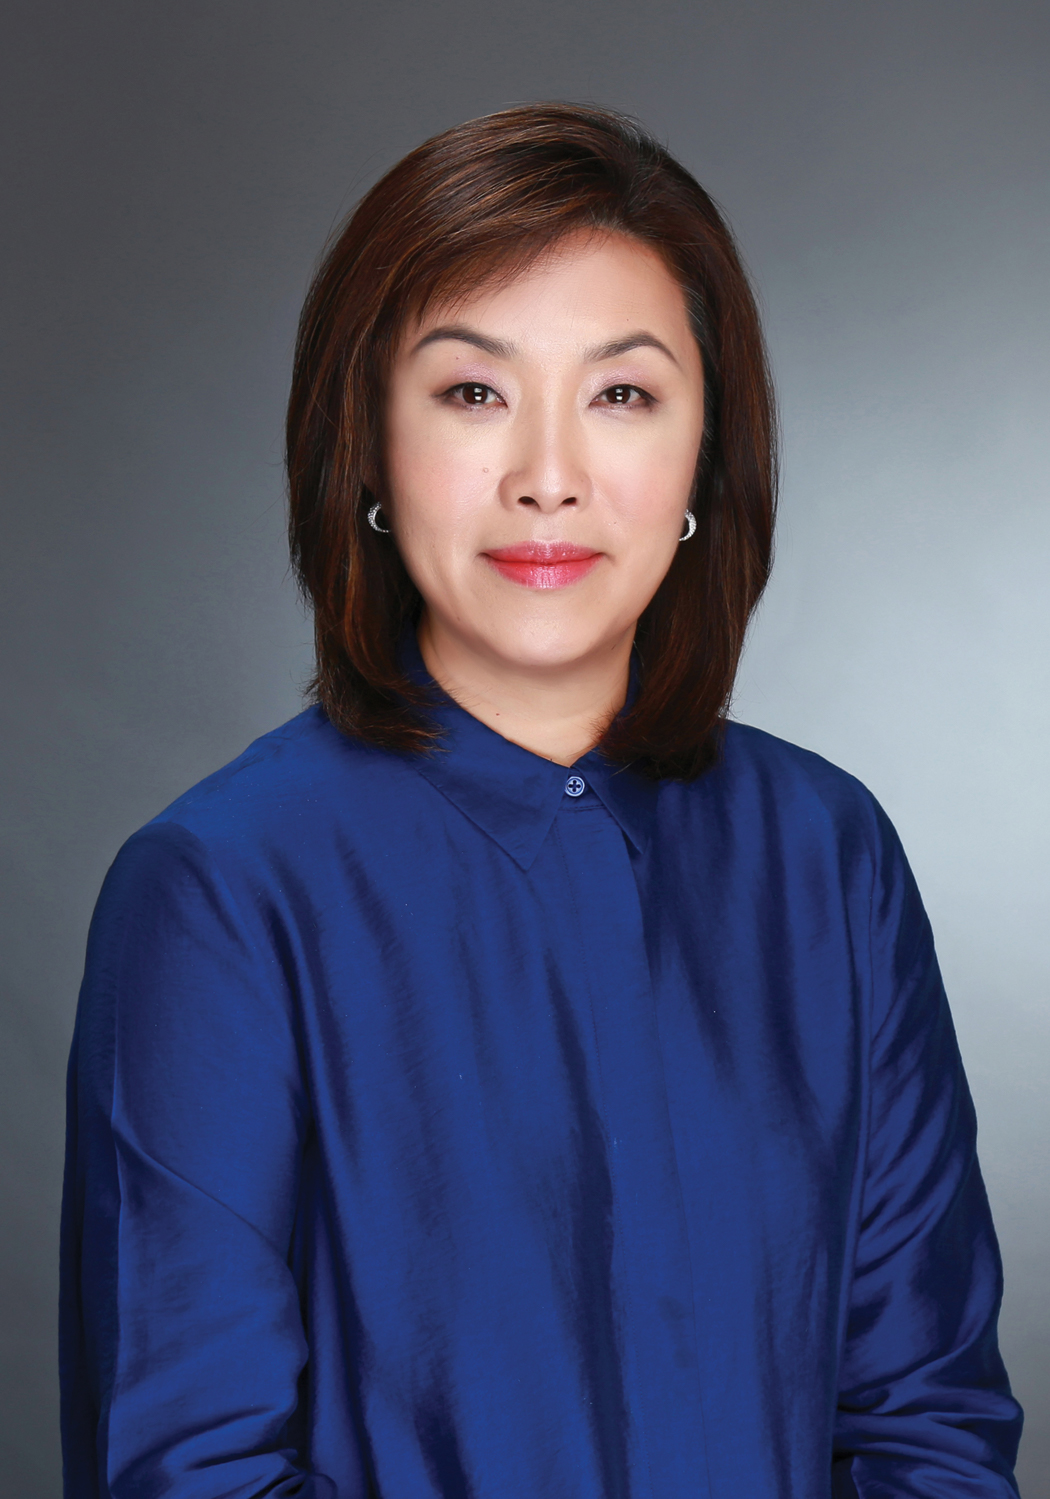 Yang Li Lian